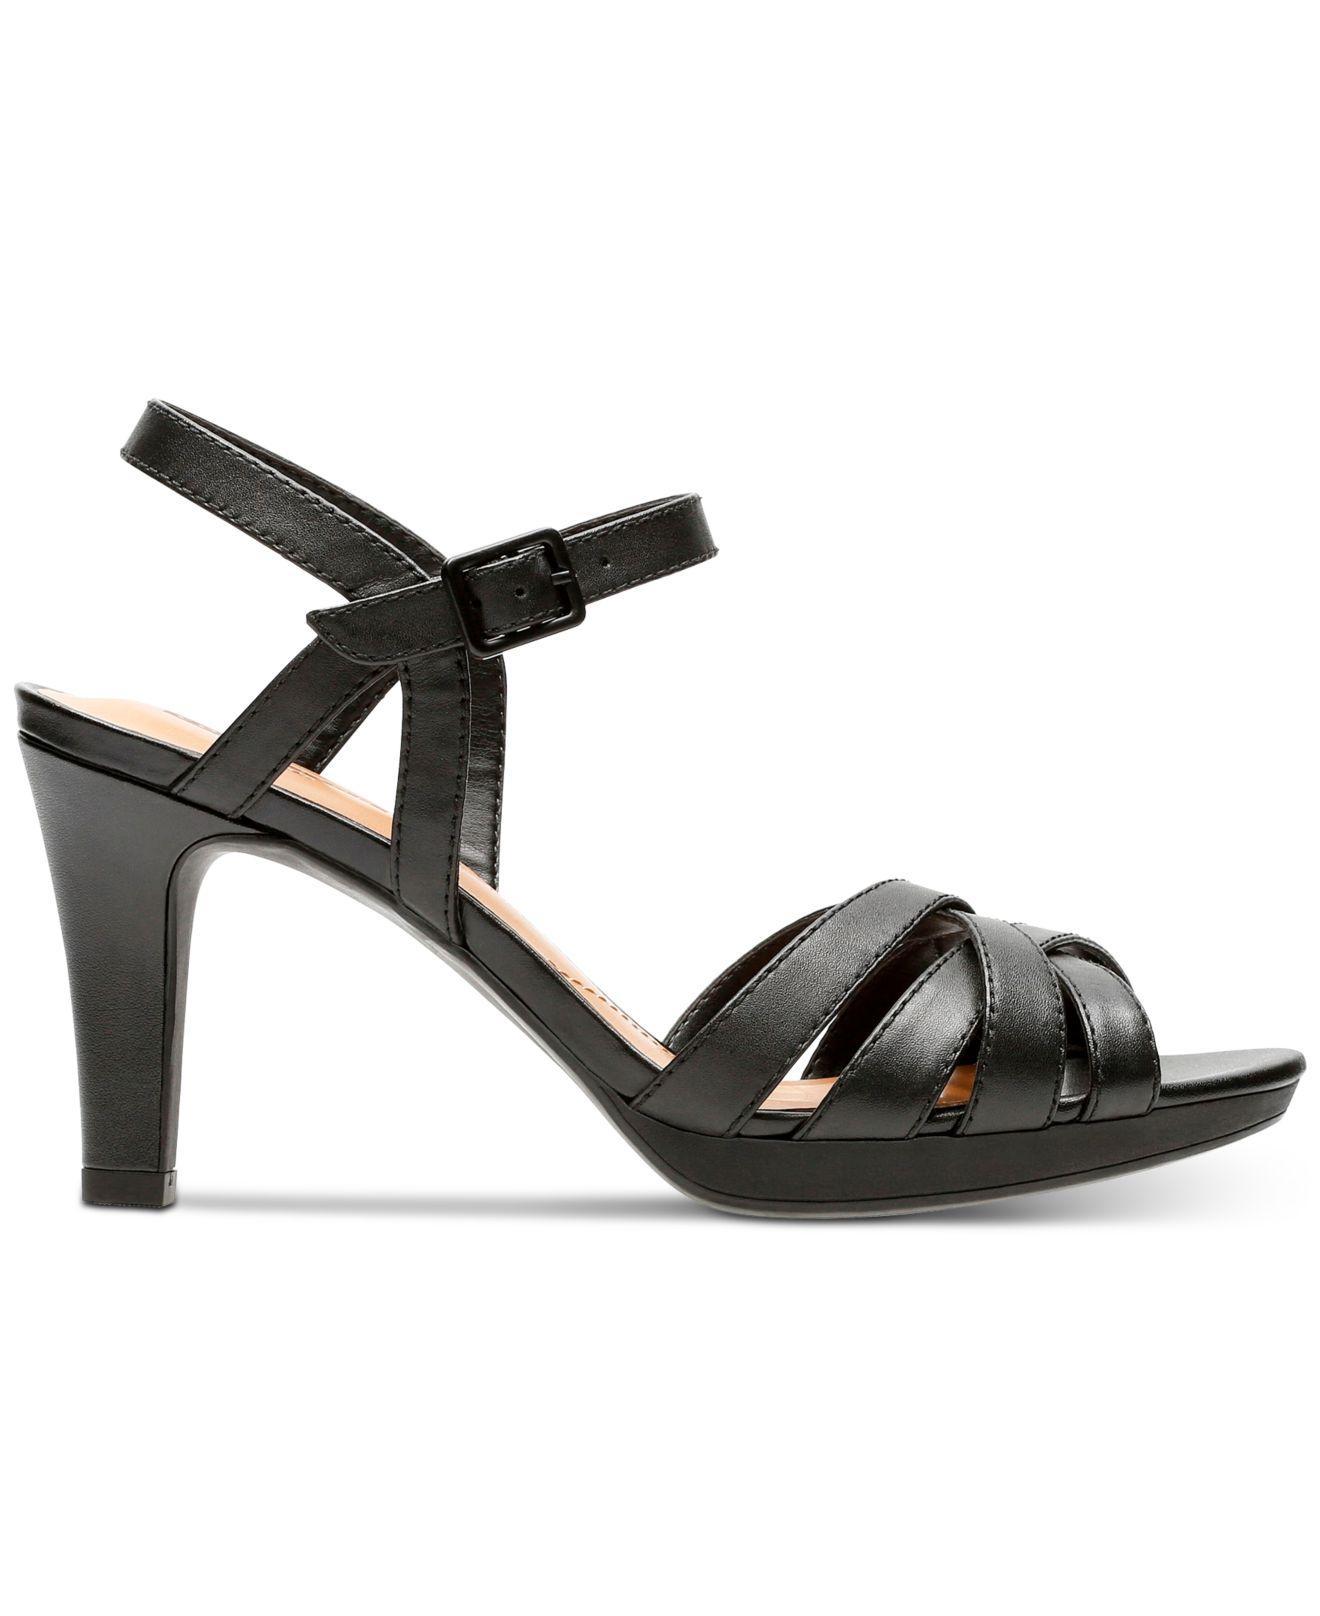 cf6017db9e1f Lyst - Clarks Adriel Wavy Heeled Sandals in Black